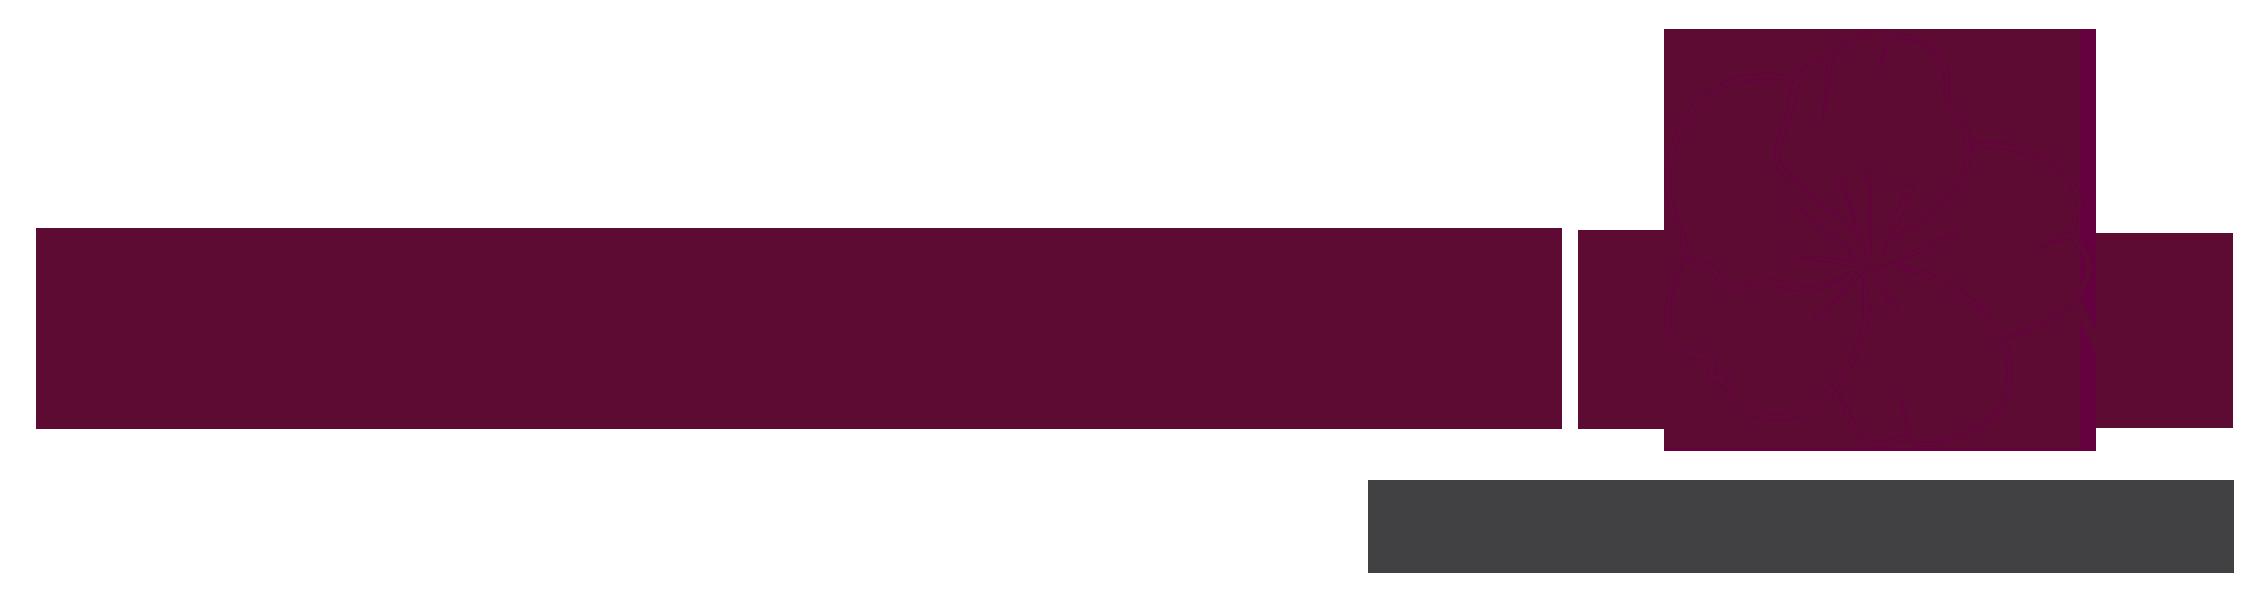 Gera Showroom